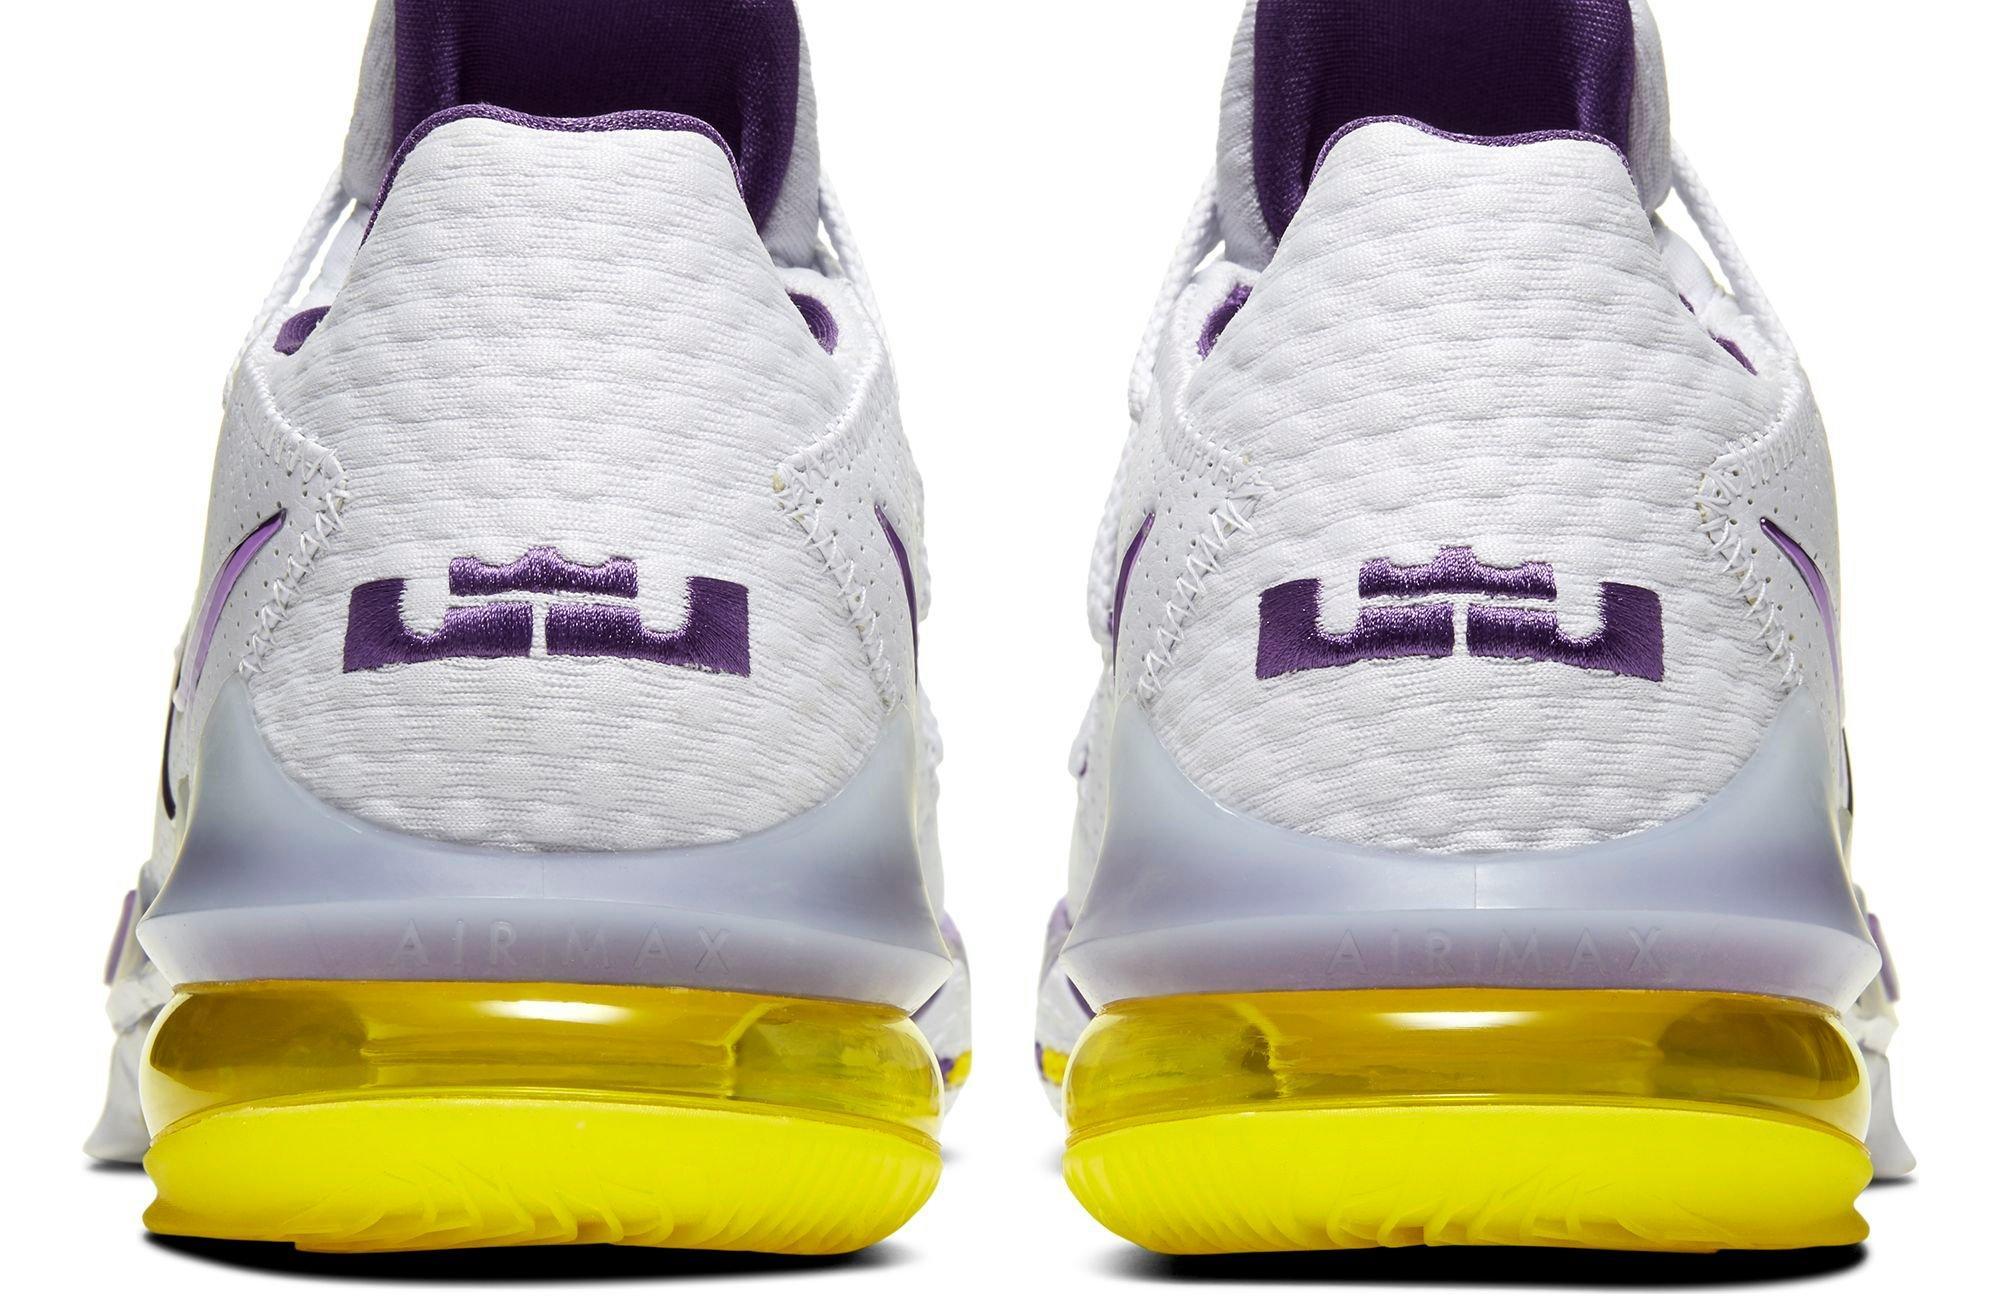 "Nike LeBron 17 Low ""Lakers Home"" White/Voltage Purple/Dynamic Yellow Men's Basketball Shoe"